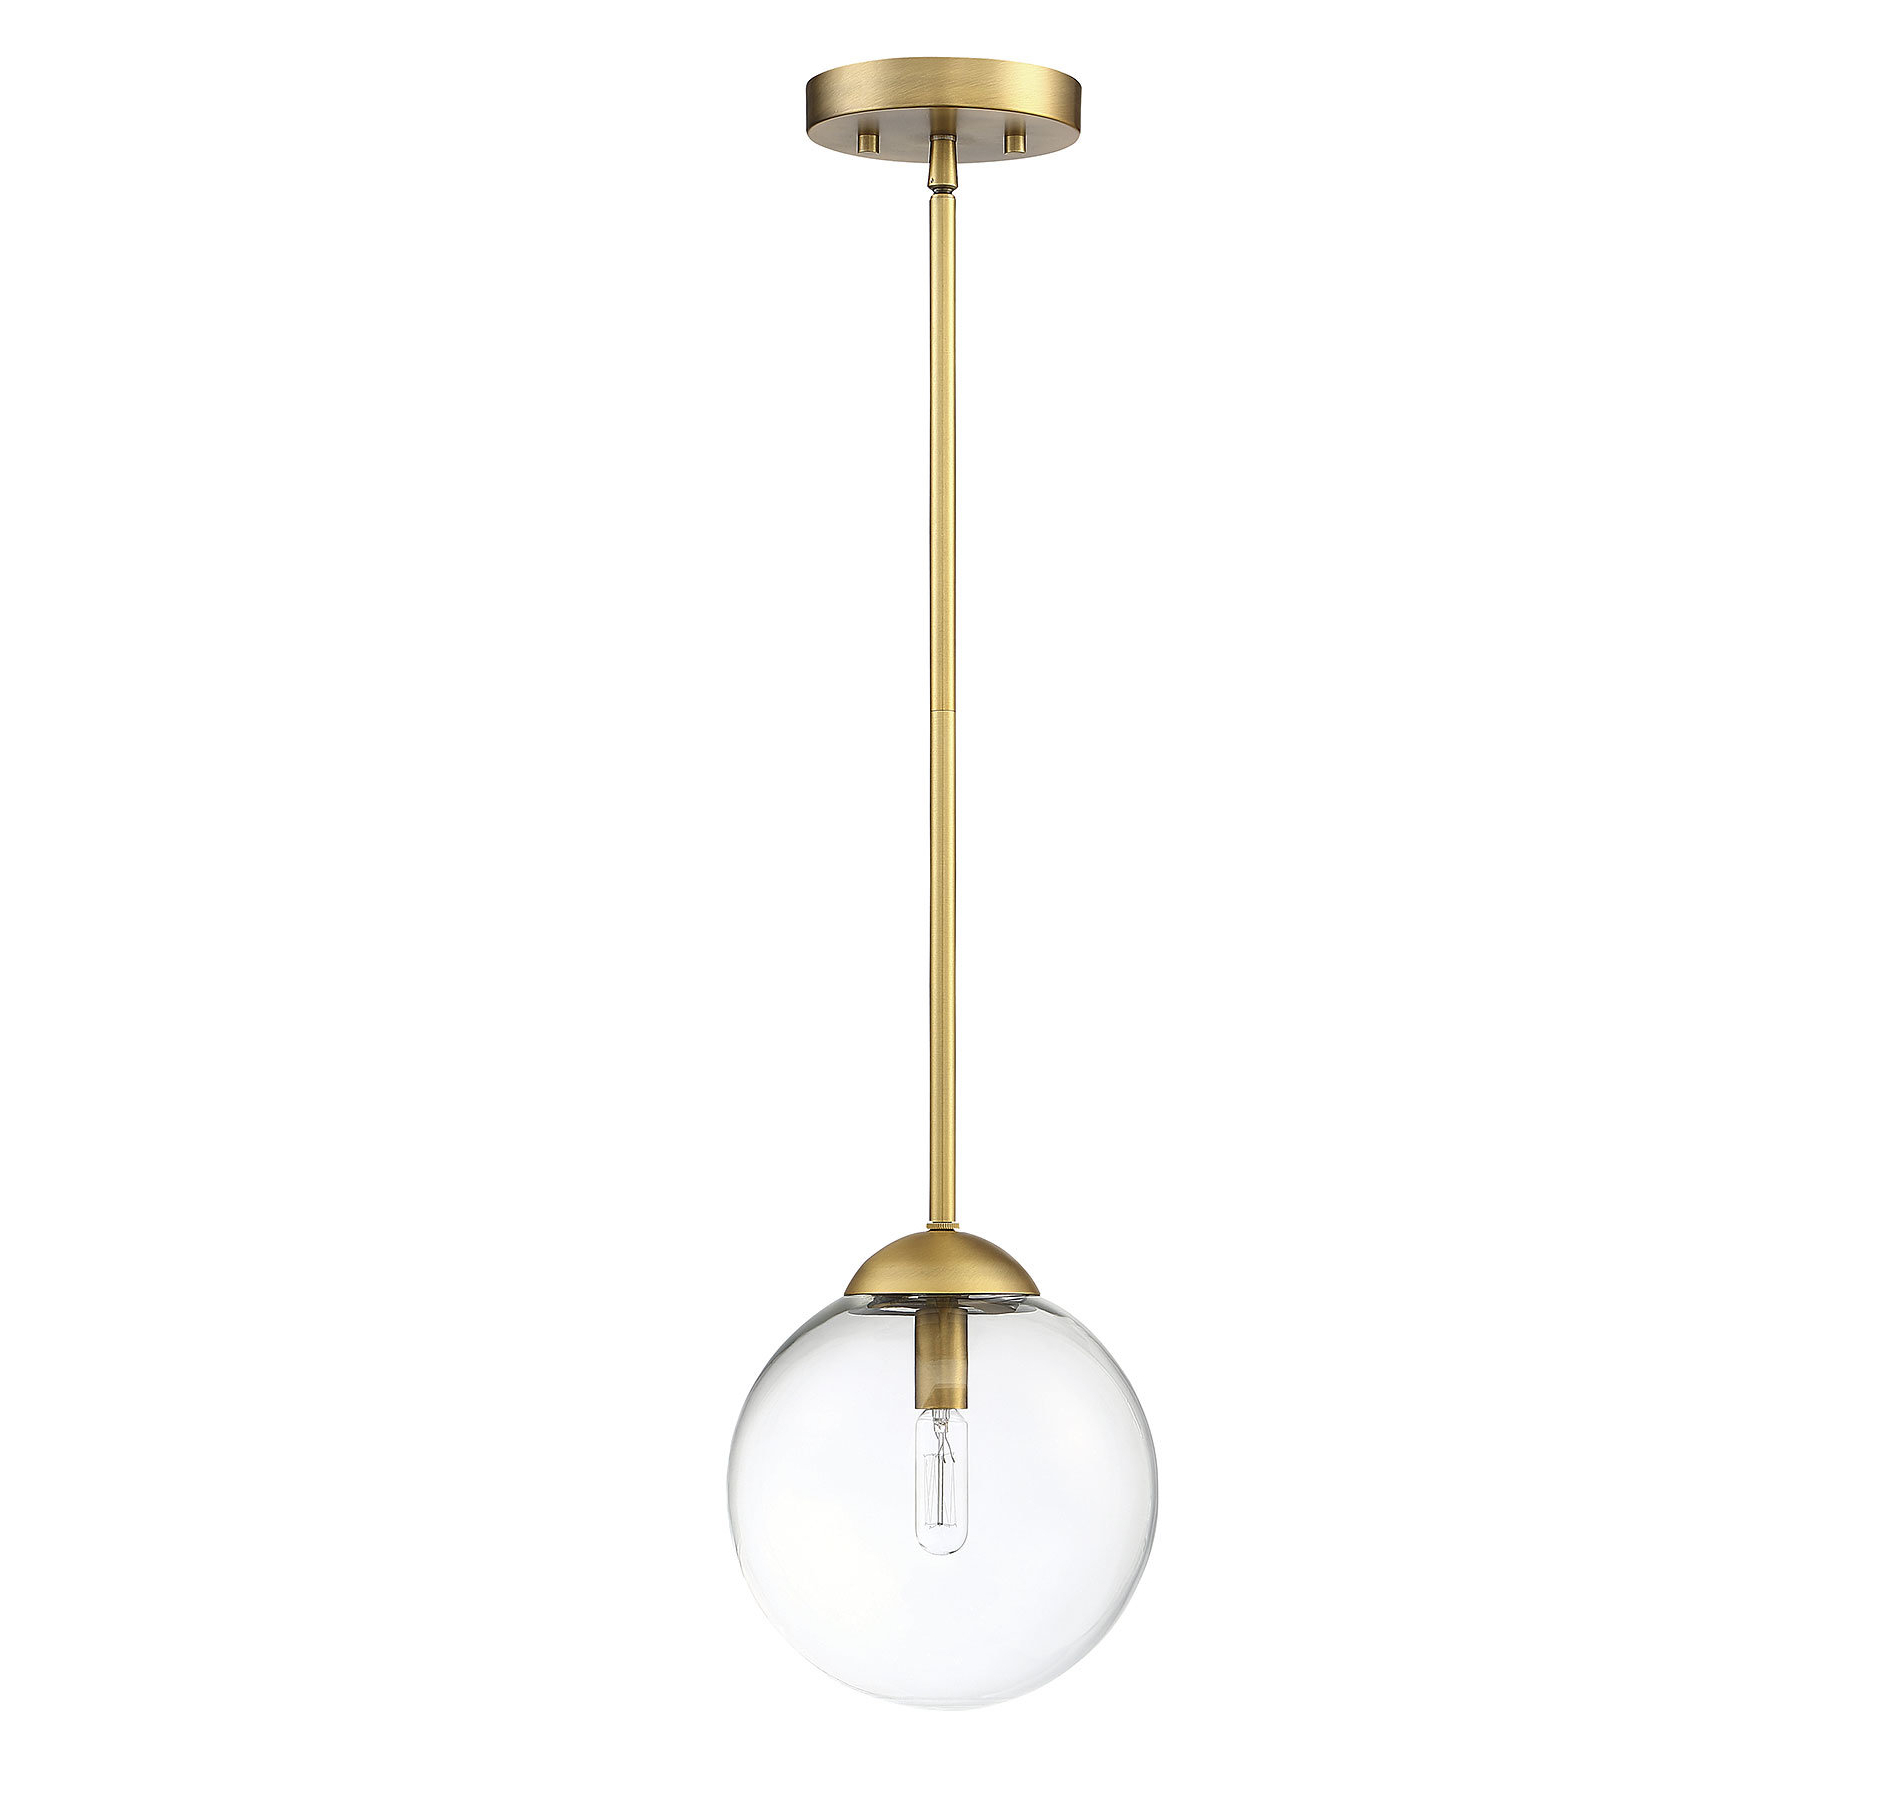 St Judes 1 Light Single Globe Pendant Regarding Current Cayden 1 Light Single Globe Pendants (View 14 of 25)